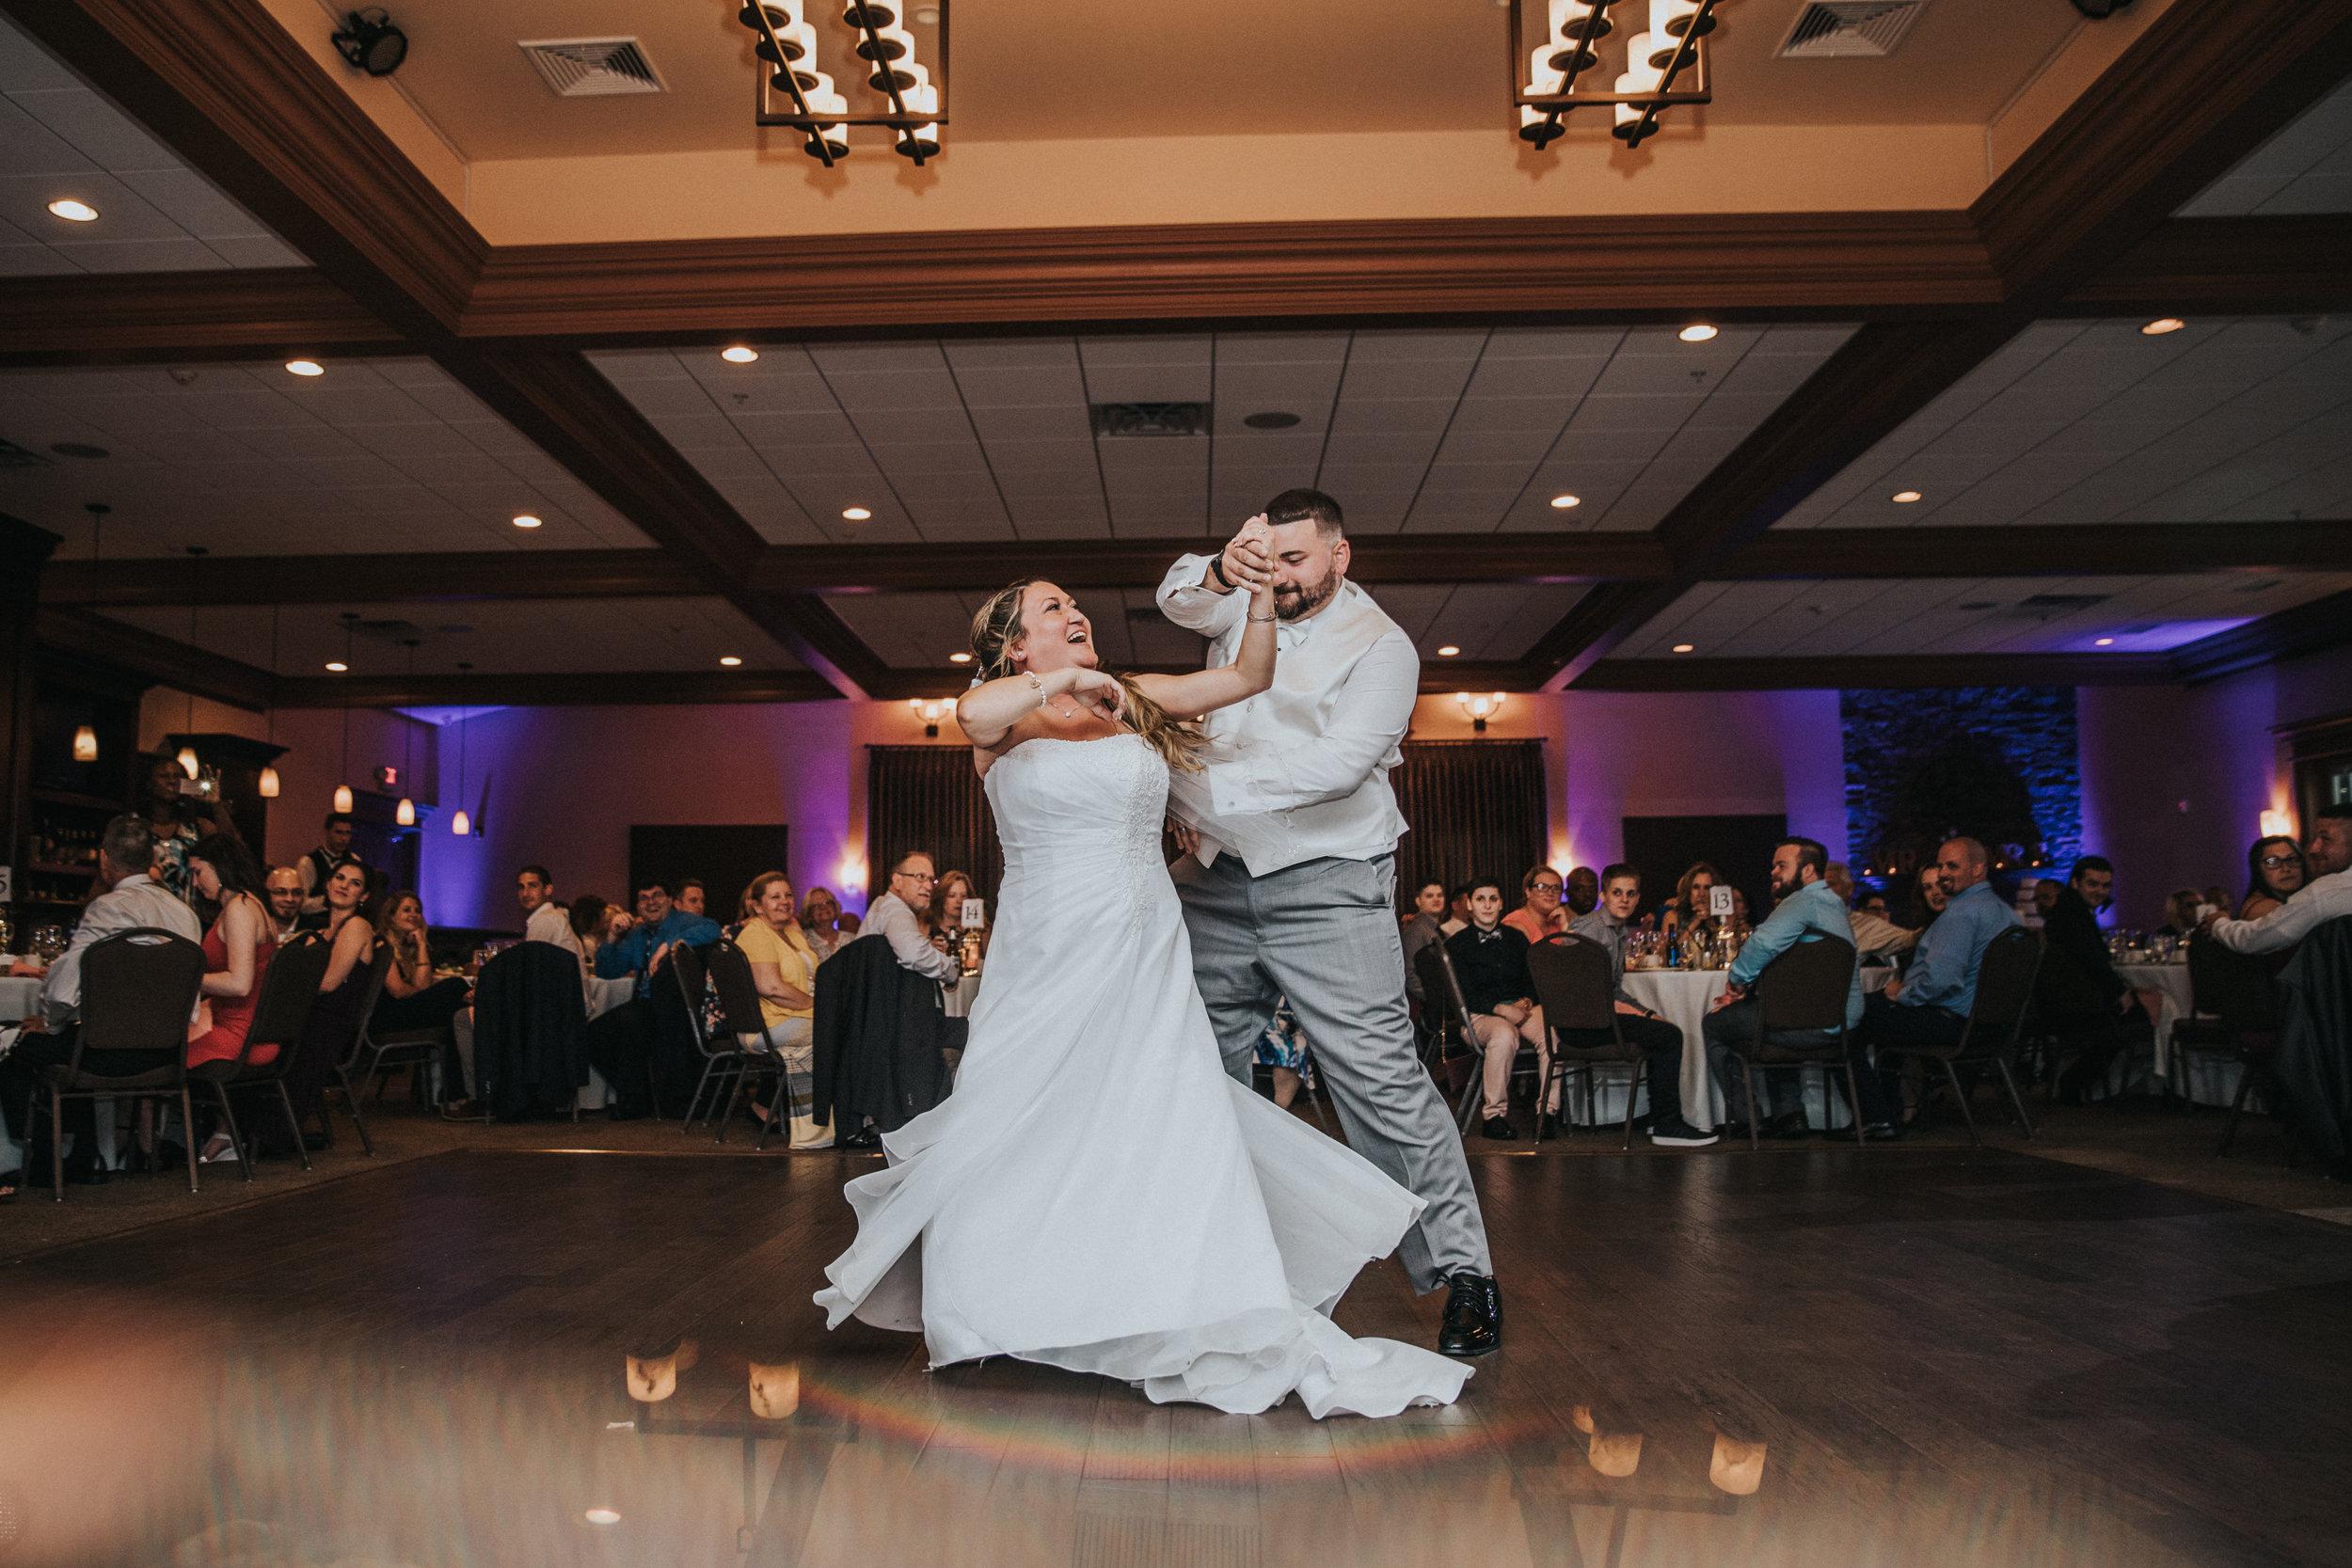 New-Jersey-Wedding-Photographer-JennaLynnPhotography-ValenzanoWinery-Reception-44.jpg